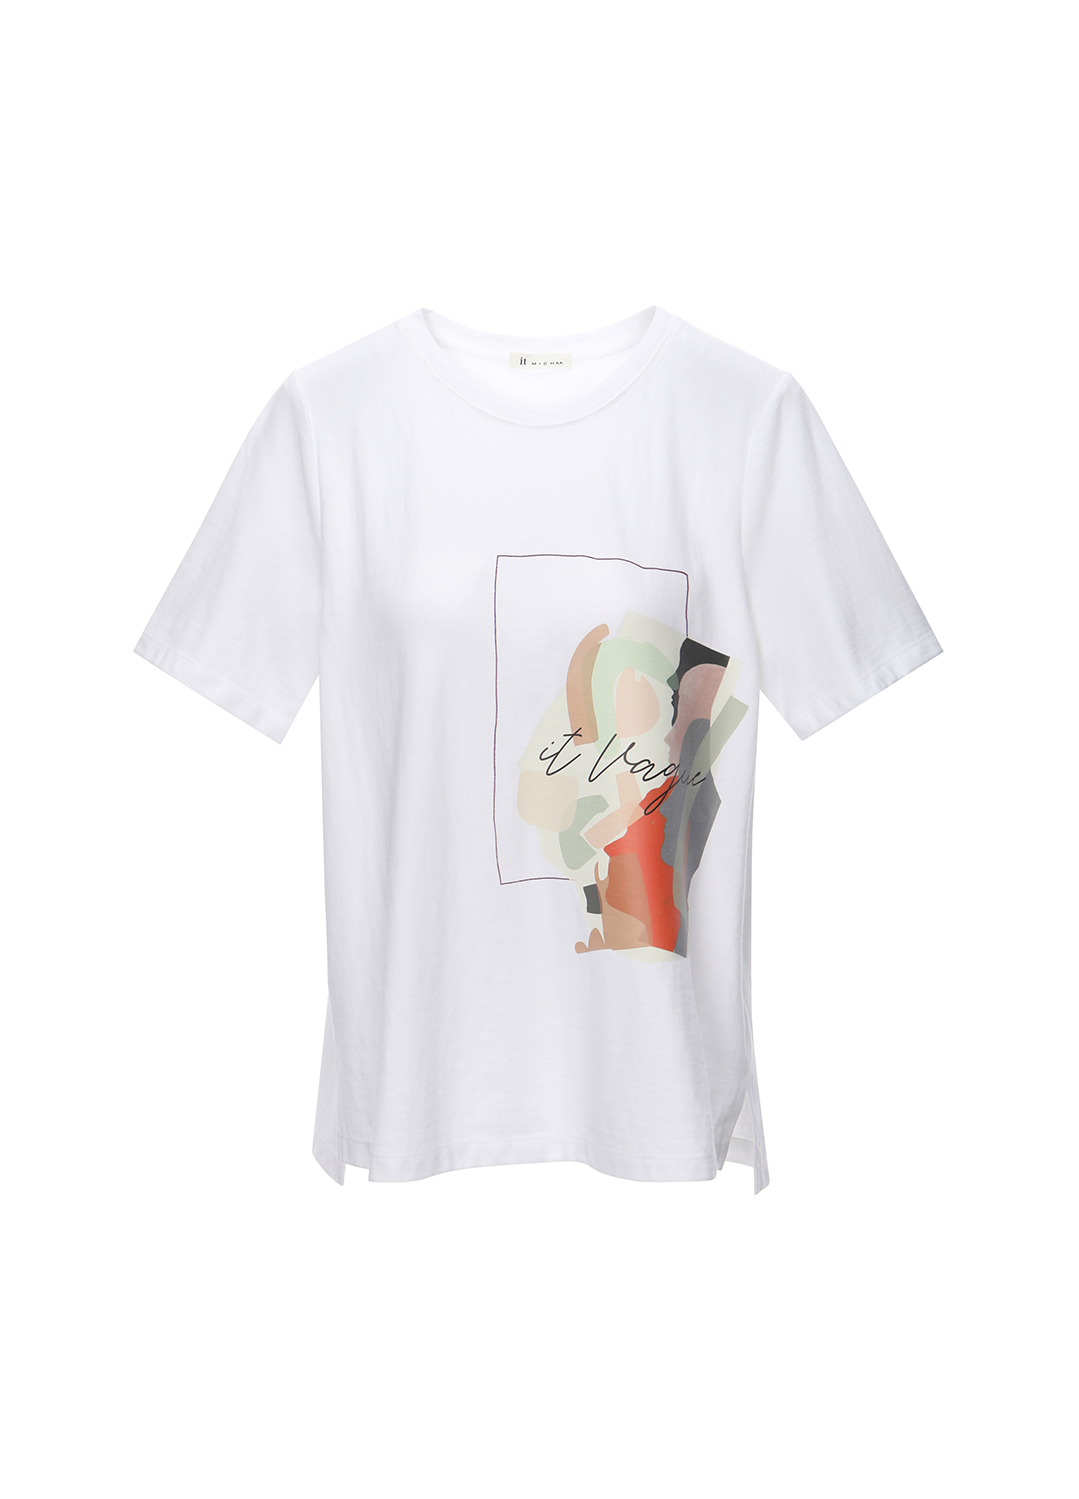 [#Color Like Me] 그래픽 프린트 티셔츠